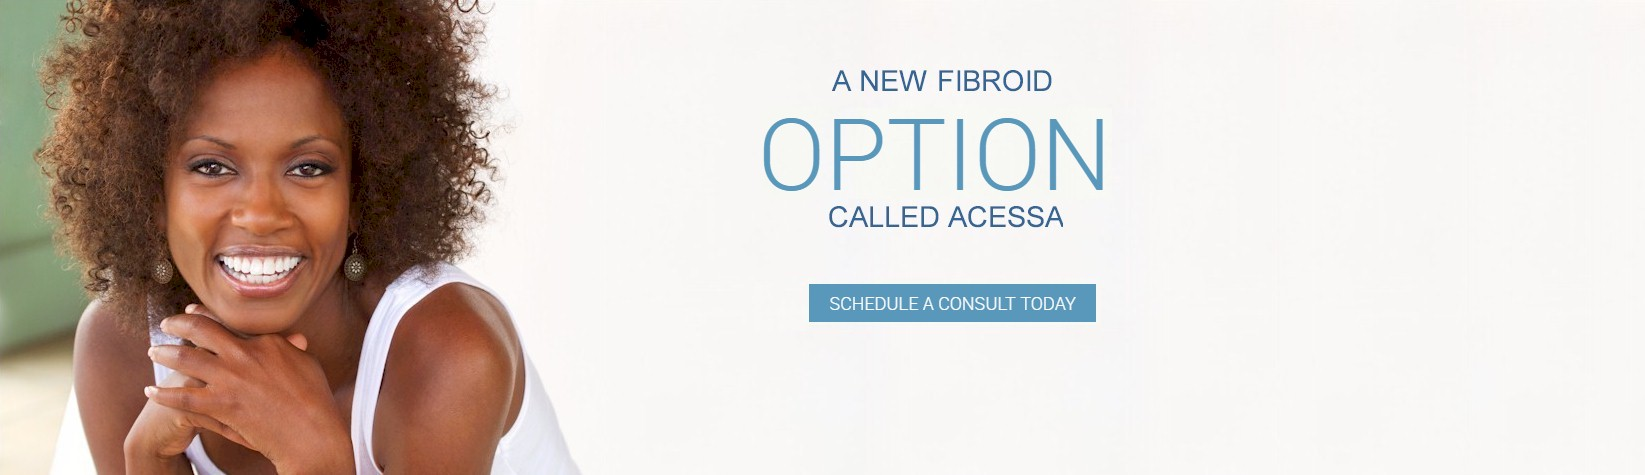 Acessa for Fibroids